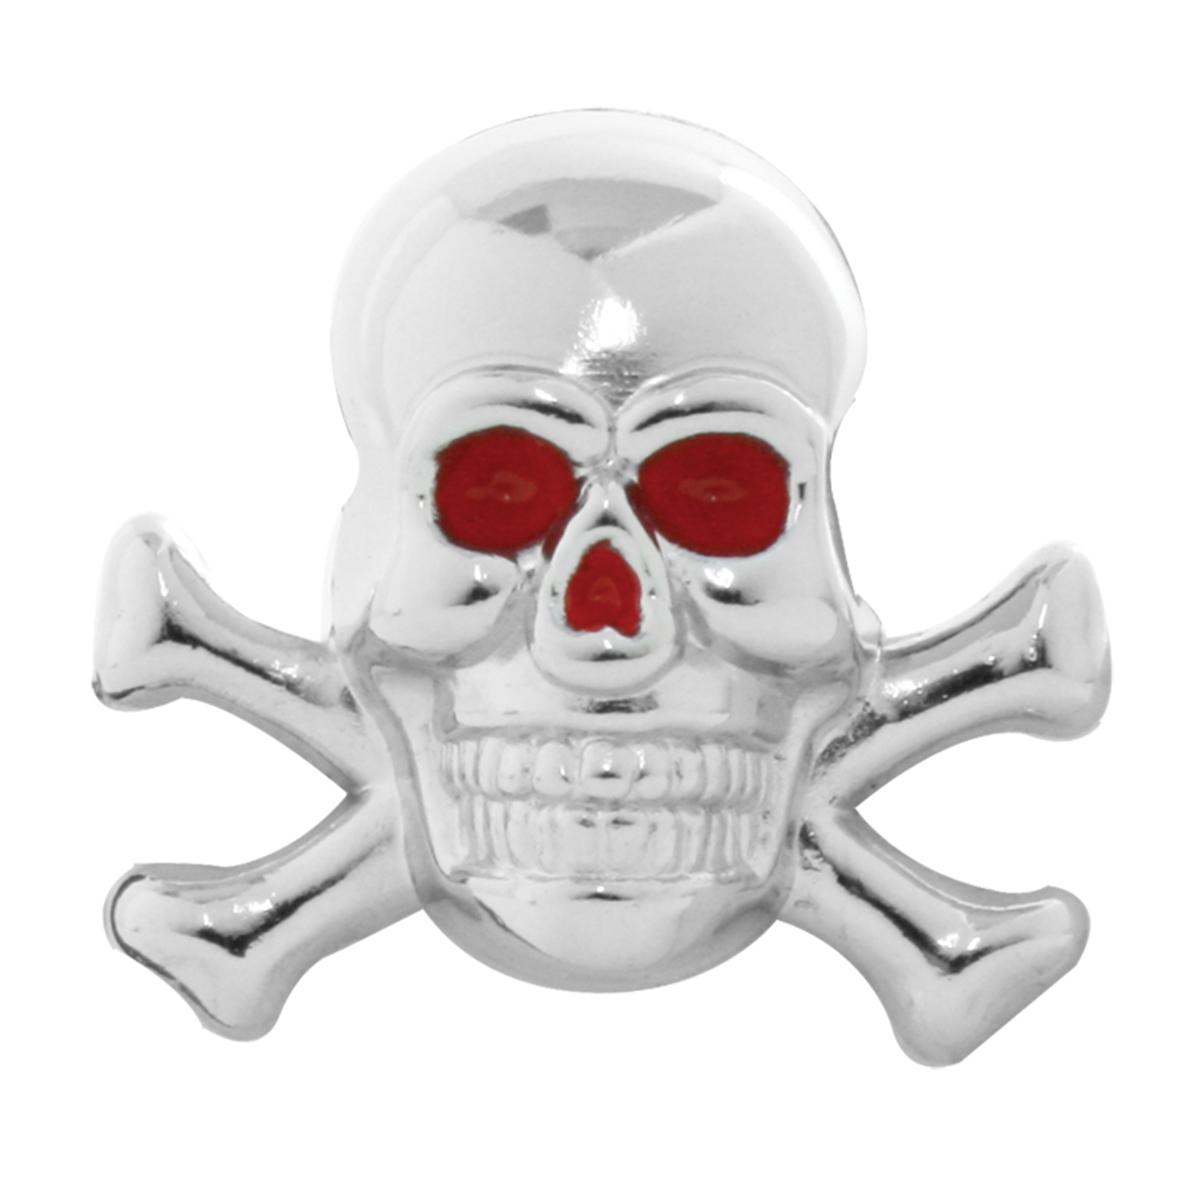 93751 Red Eye Skull with Cross Bones Dash Knobs